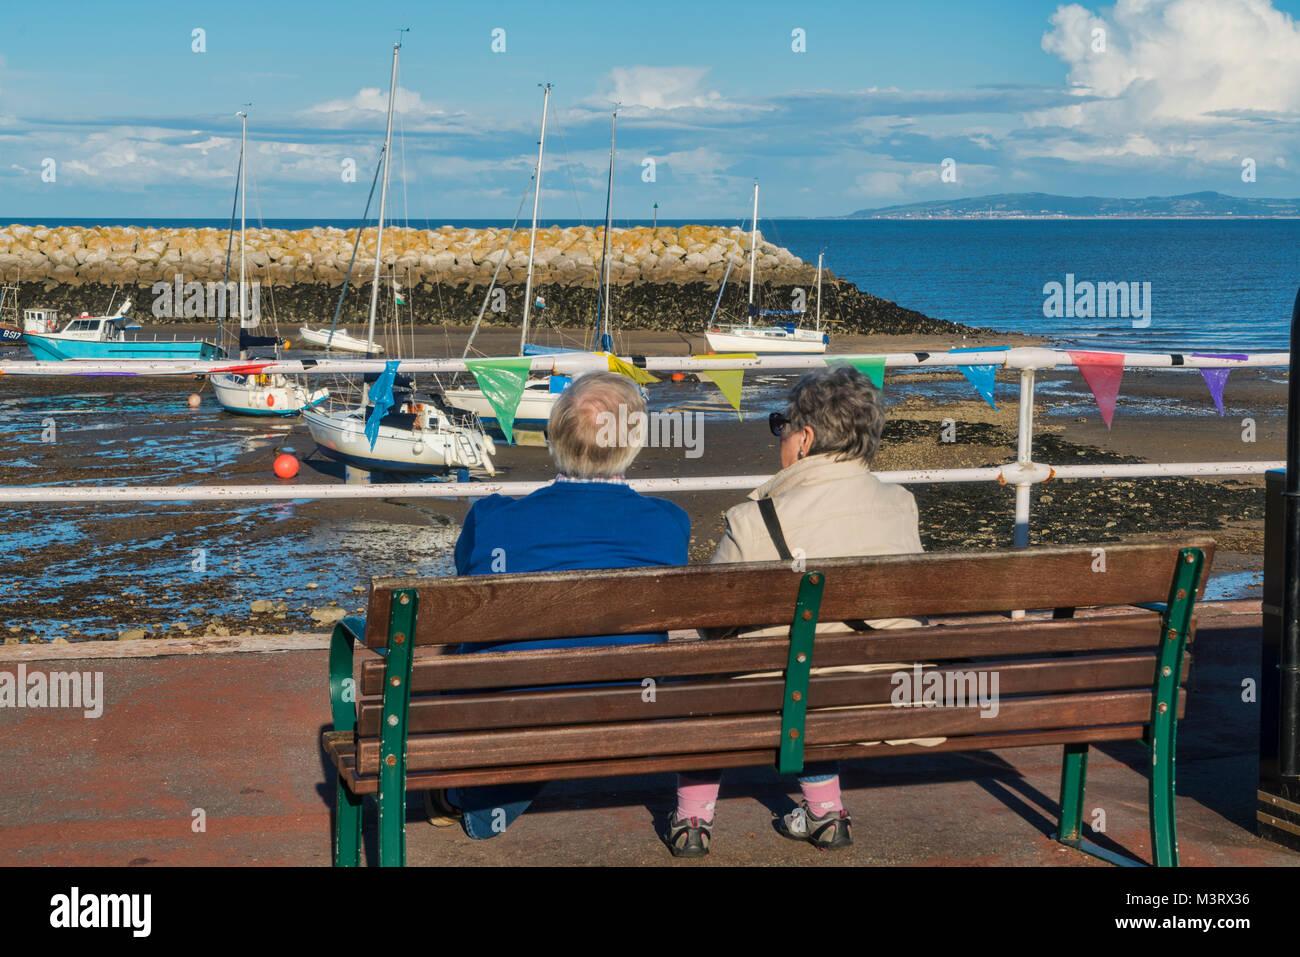 Promenade, Rhos on Sea, Colwyn Bay, seafront, north Wales, UK - Stock Image